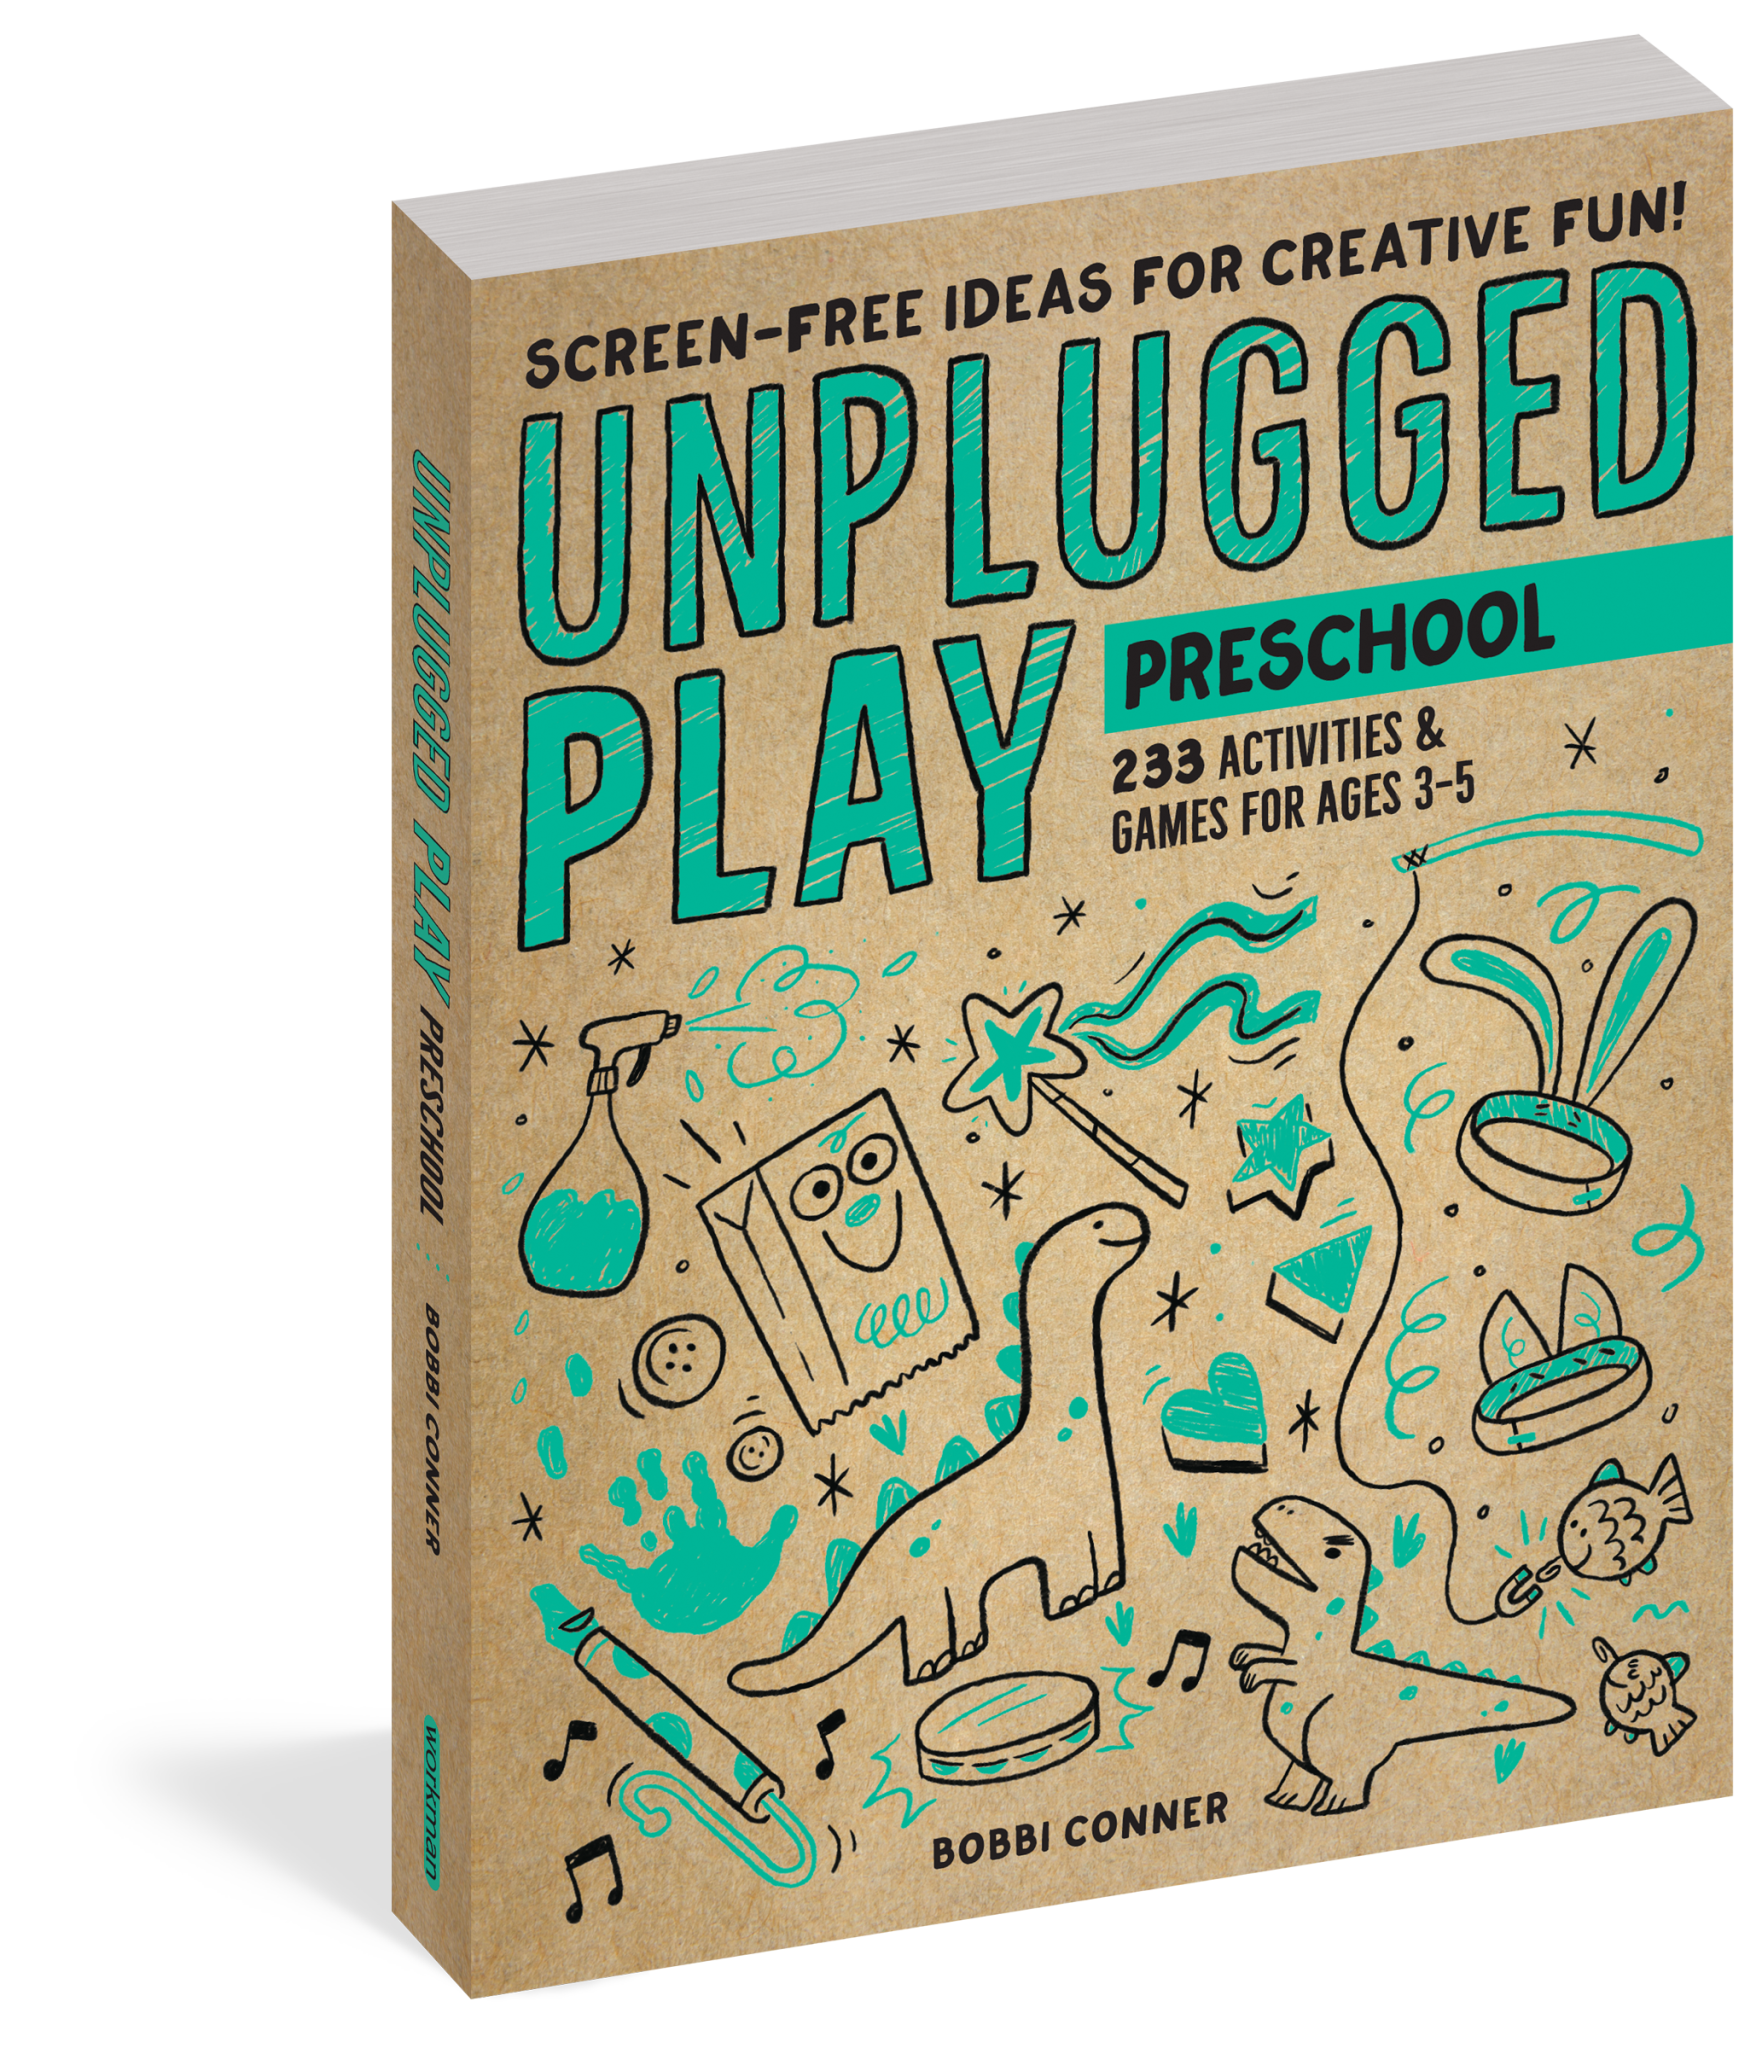 workman publishing Unplugged Play